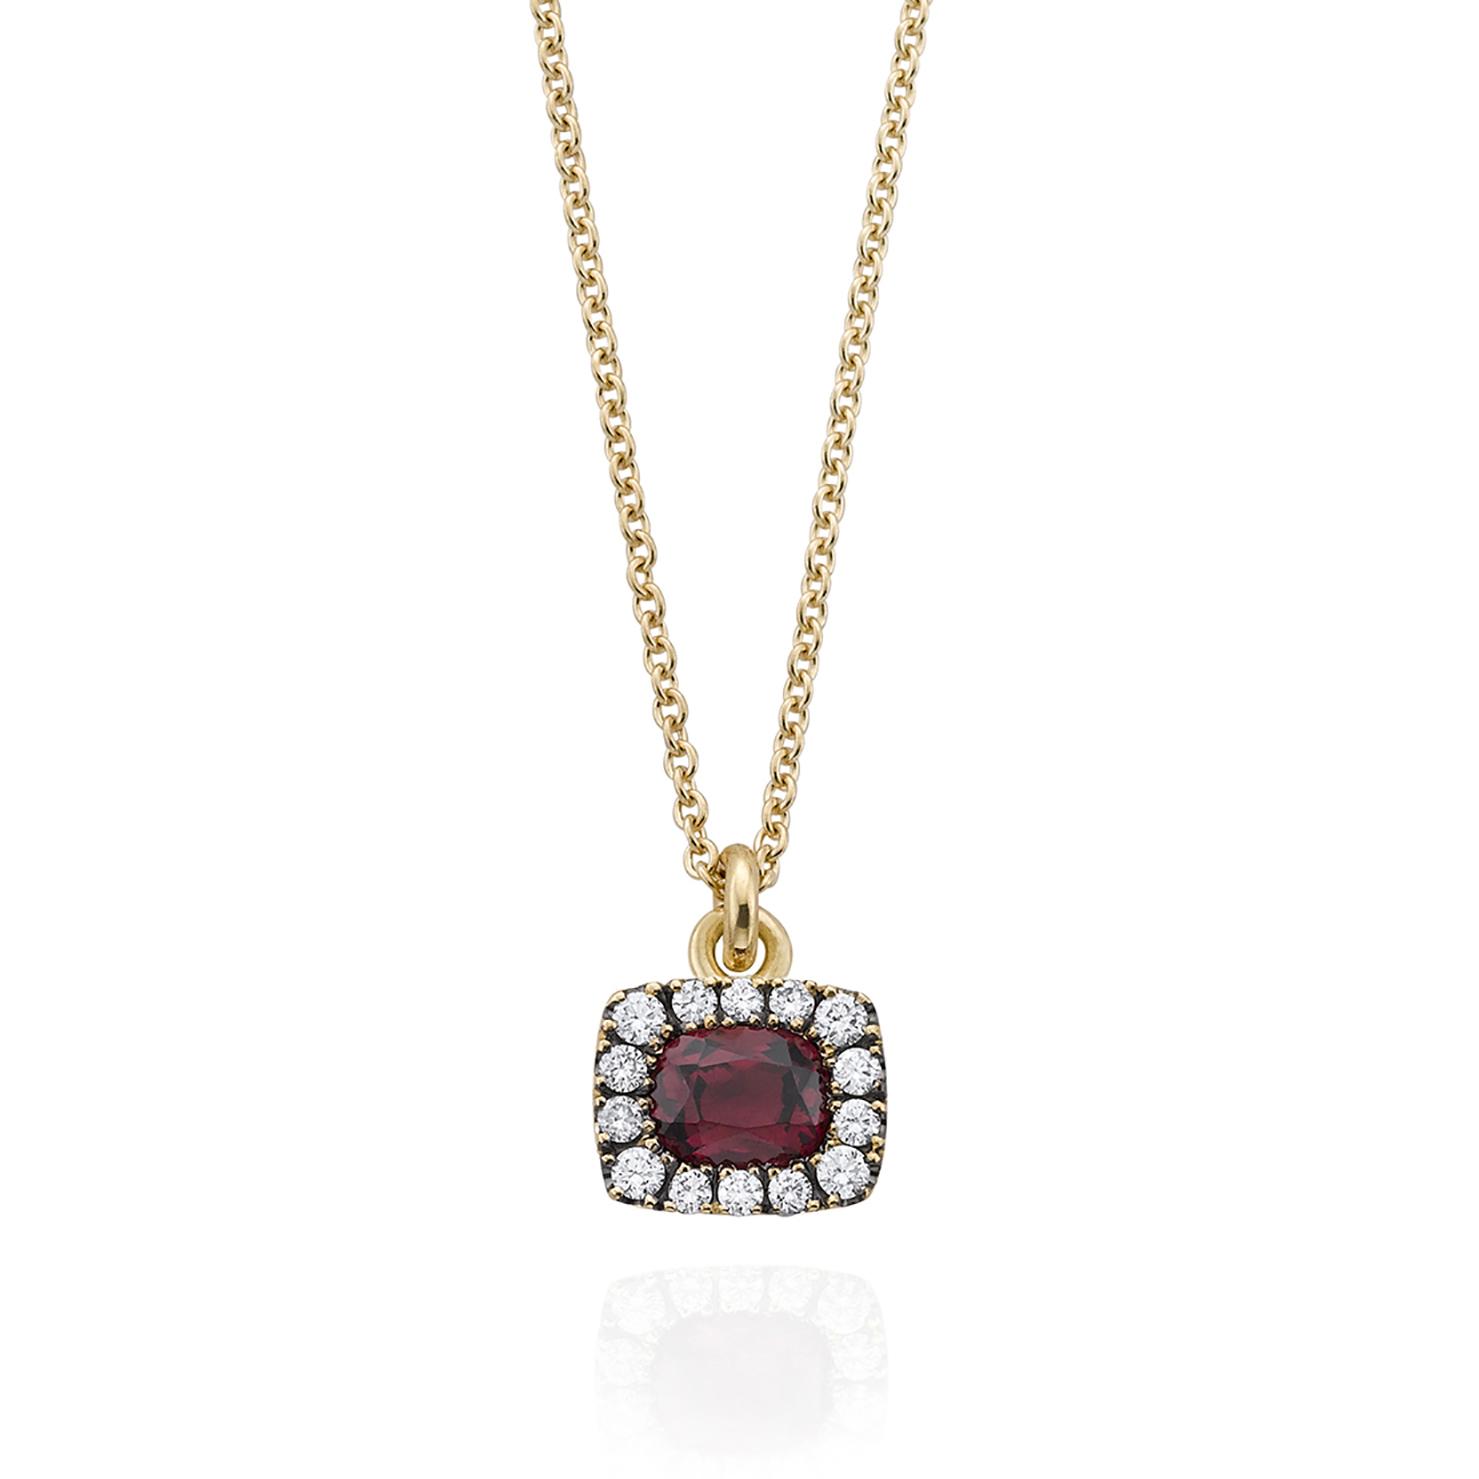 Original centre stone reset with diamonds